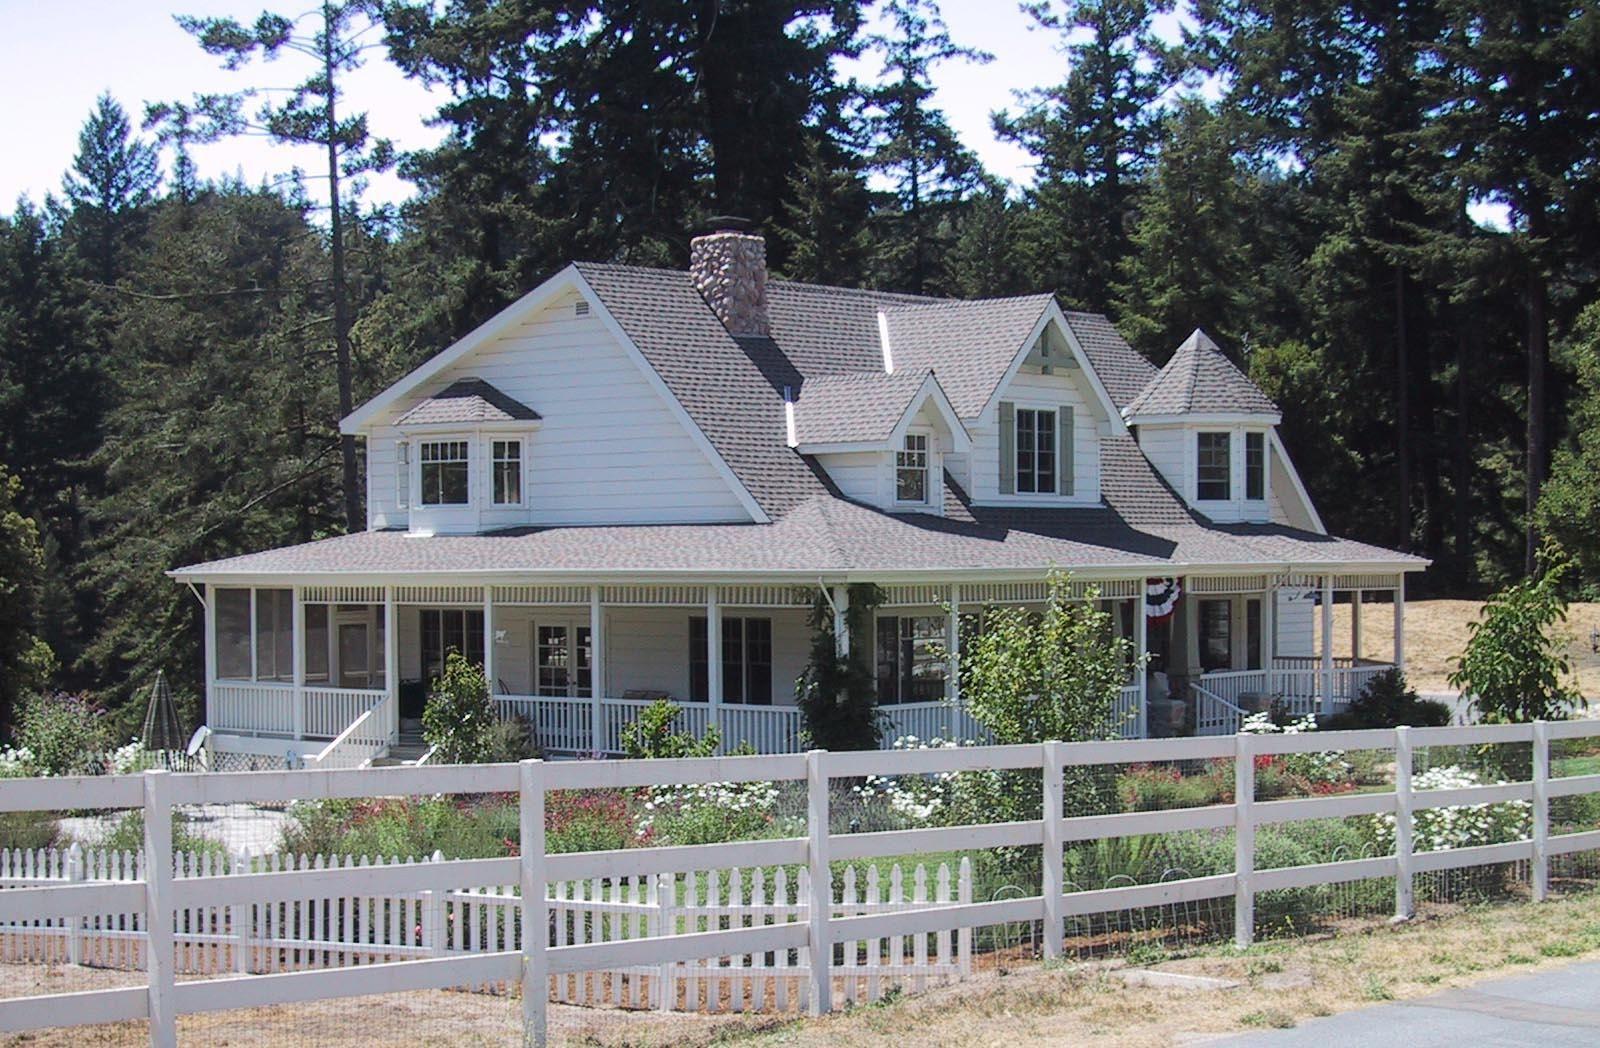 Wonderful One Story Wrap Around Porch House Plans 4 House Plans With Wrap Around Porches Pallet House Porch House Plans Country House Plans House Exterior